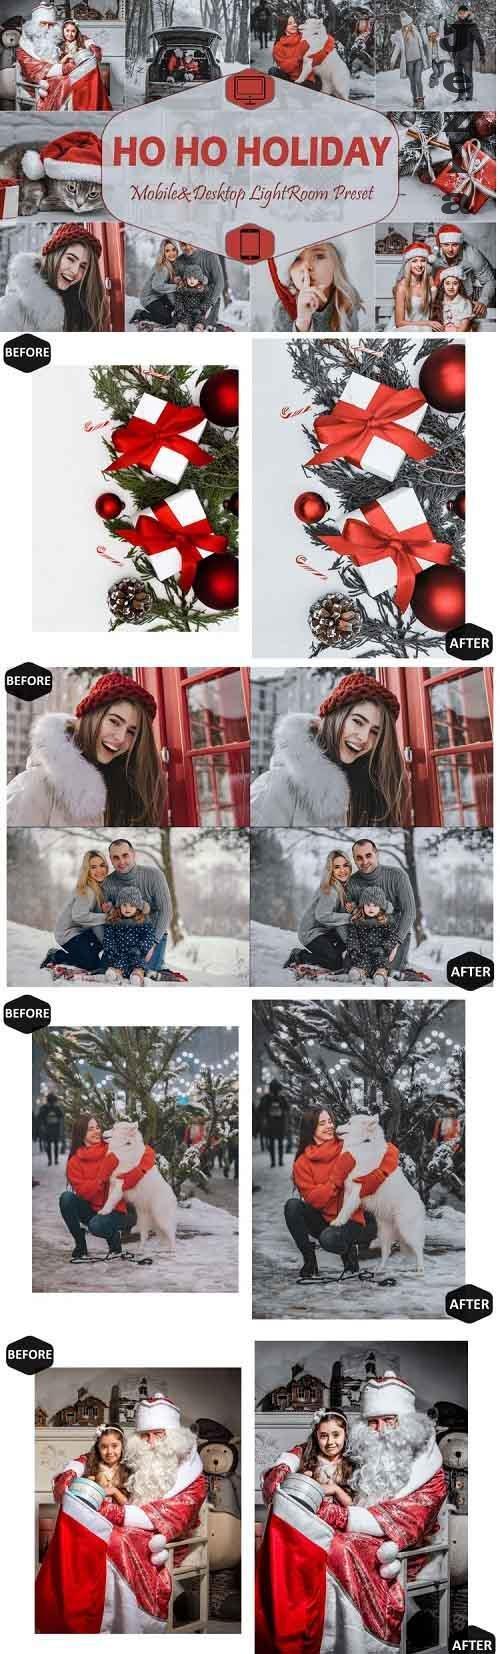 10 Ho Ho Holiday Mobile & Desktop Lightroom Presets, Xmas - 951516